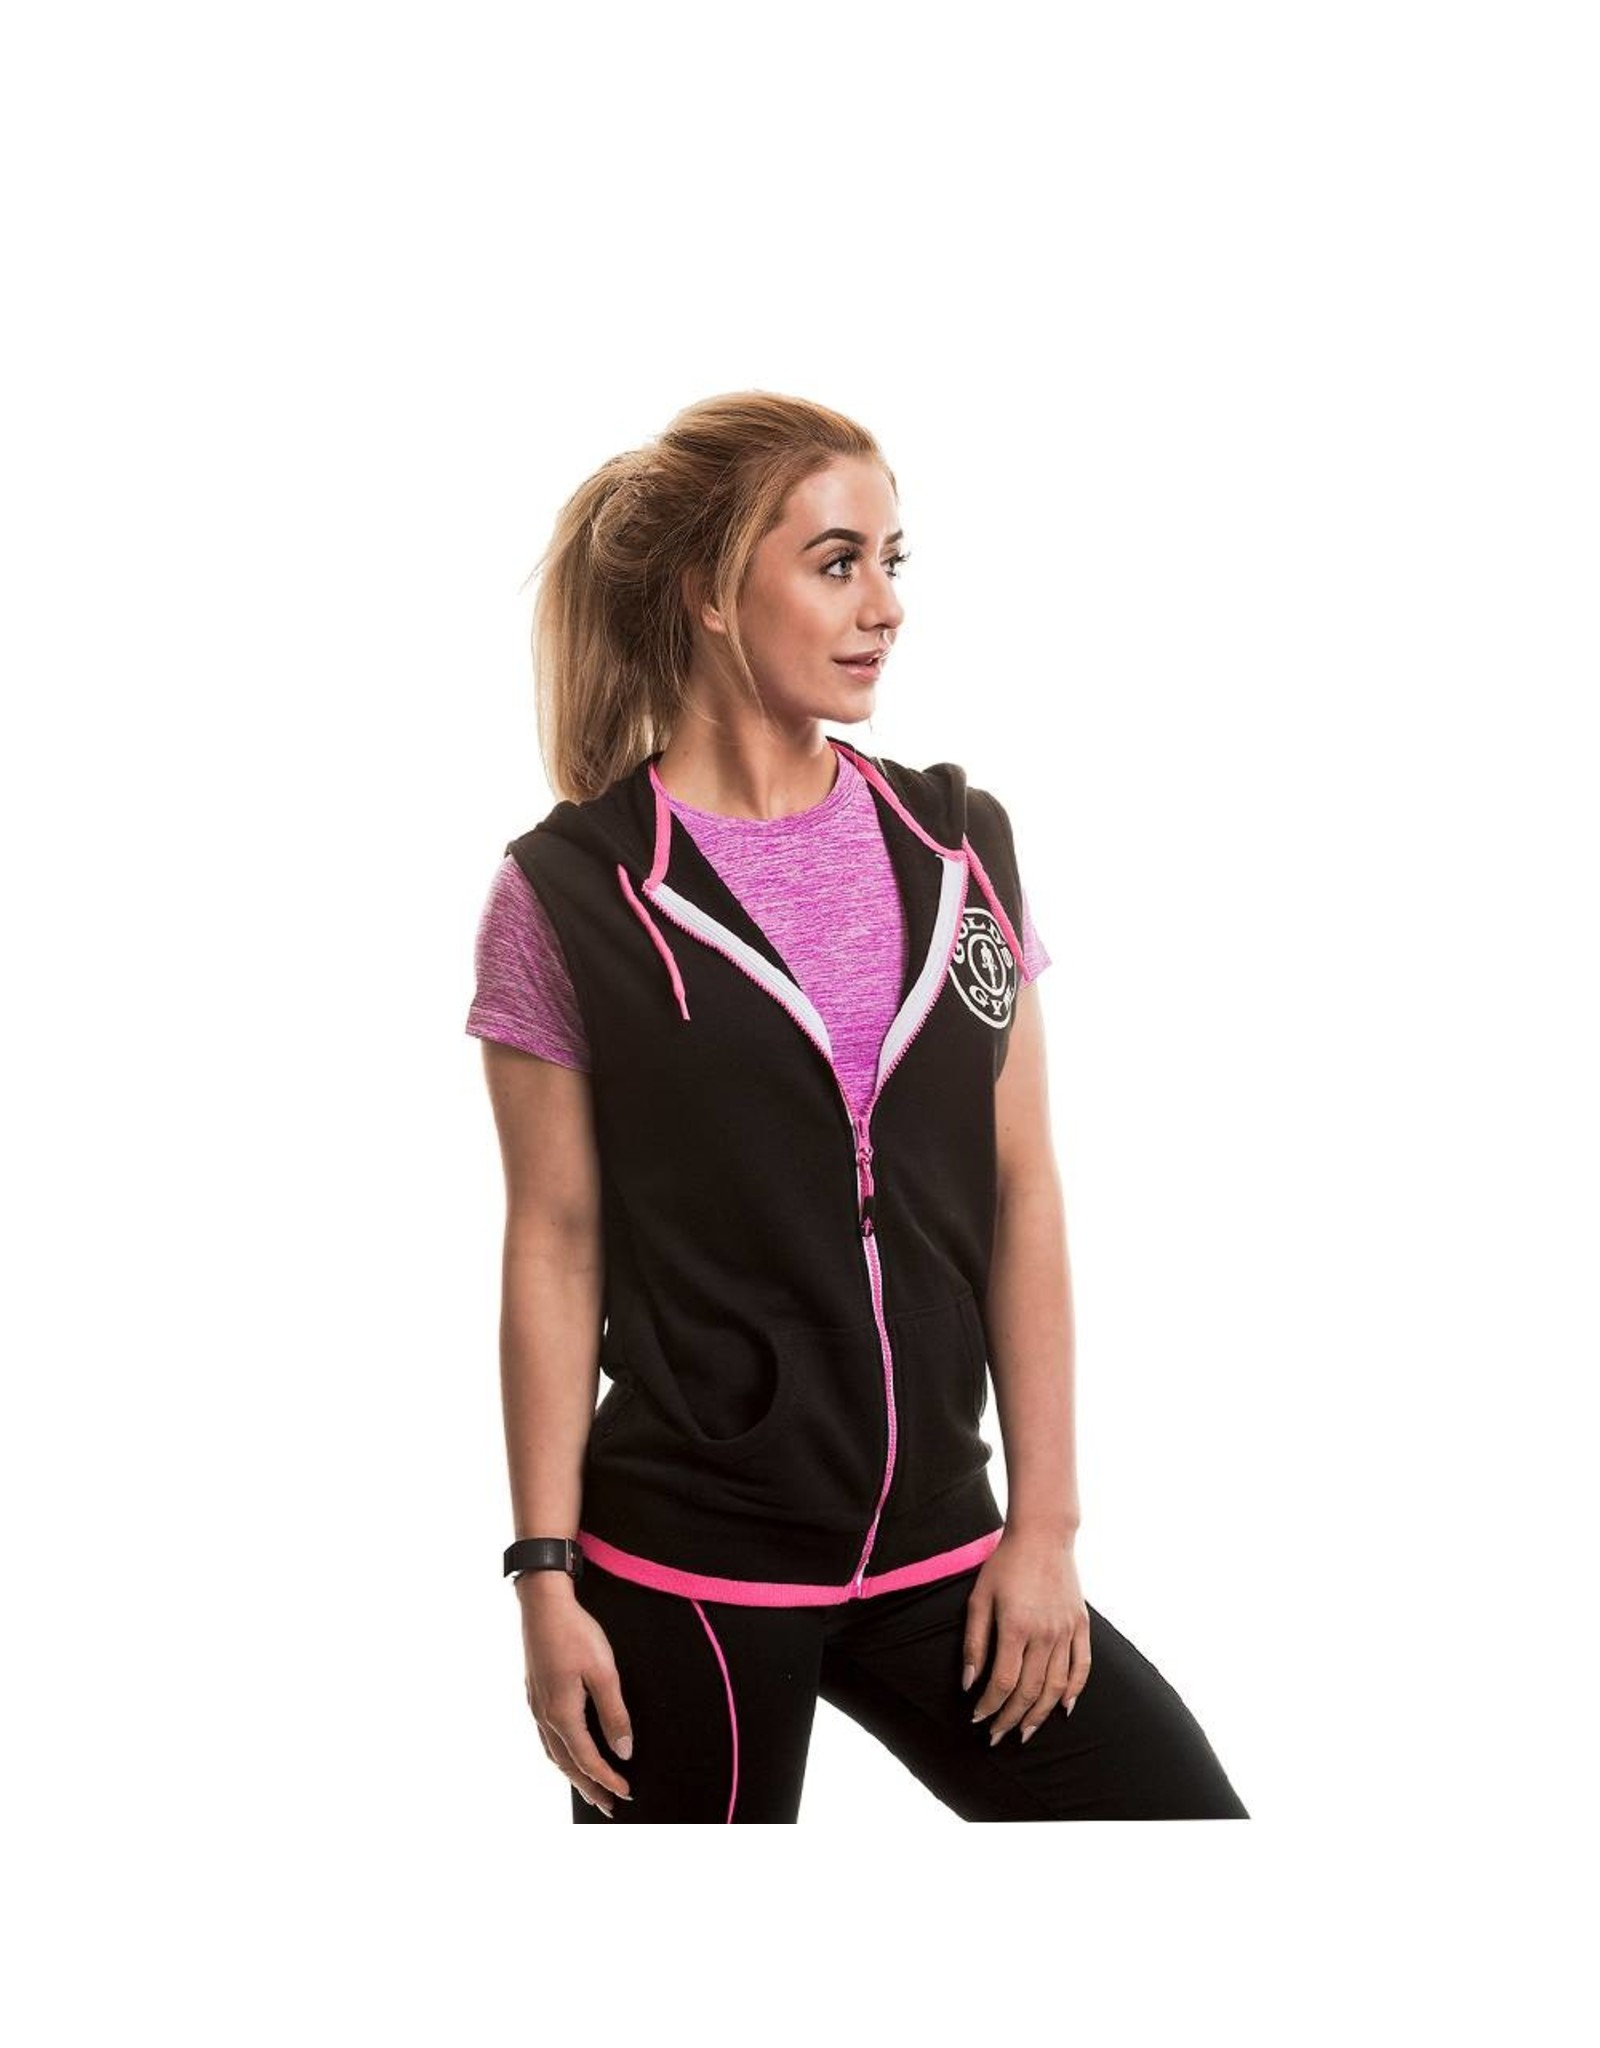 Gold's Gym Muscle Joe Premium Sleeveless Hoodie - Black